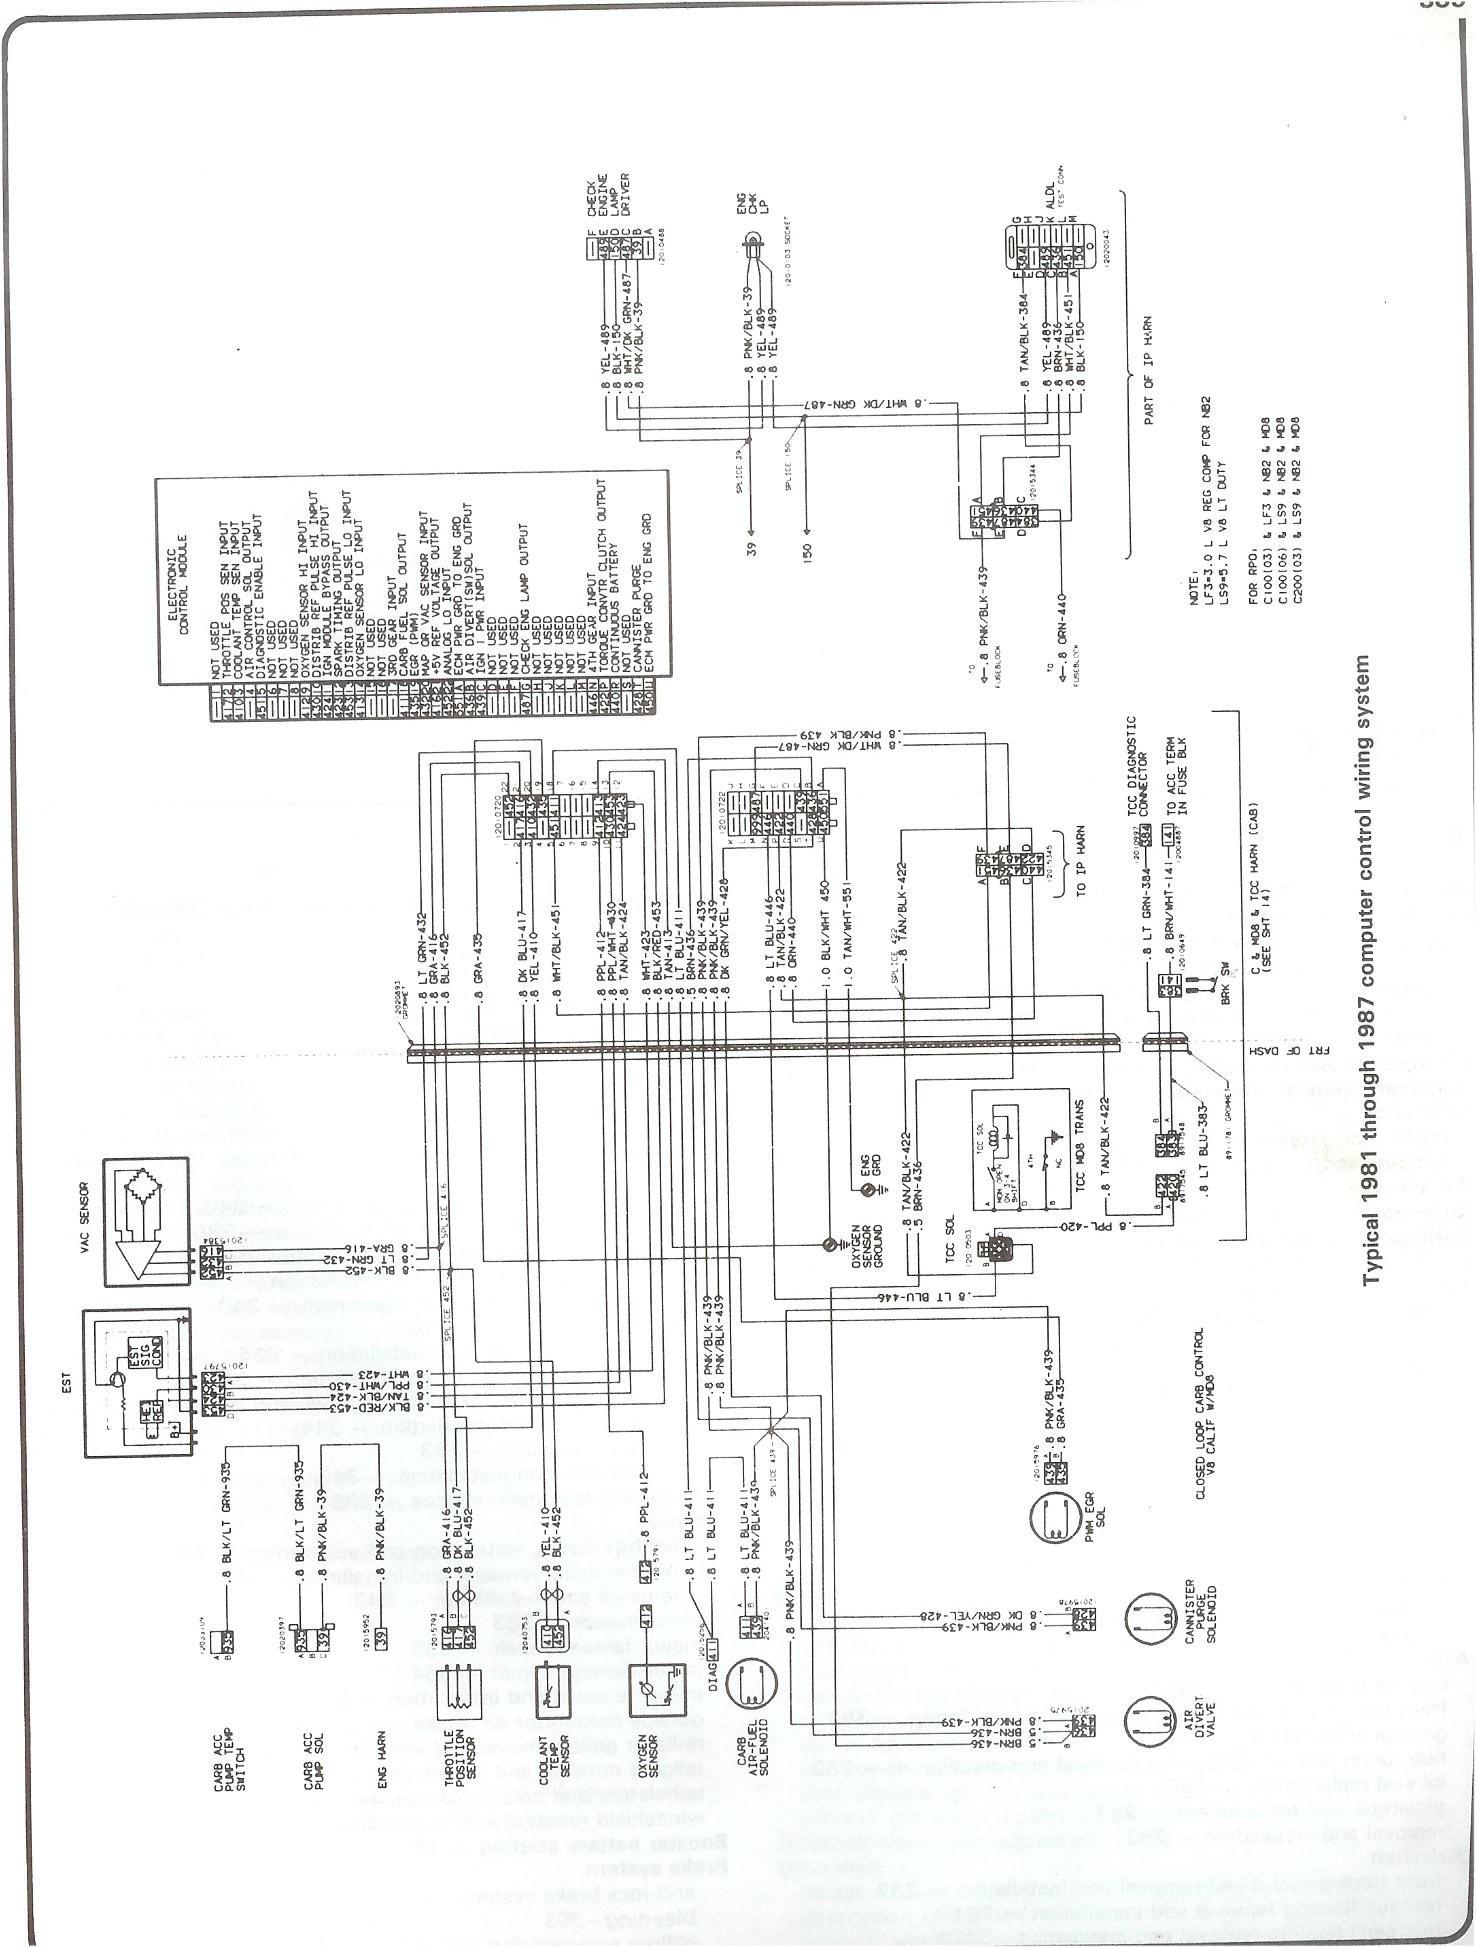 2004 chevy silverado instrument cluster wiring diagram plete 73 87 diagrams rh forum 87chevytrucks 1966 wire harness a 1998 gauge